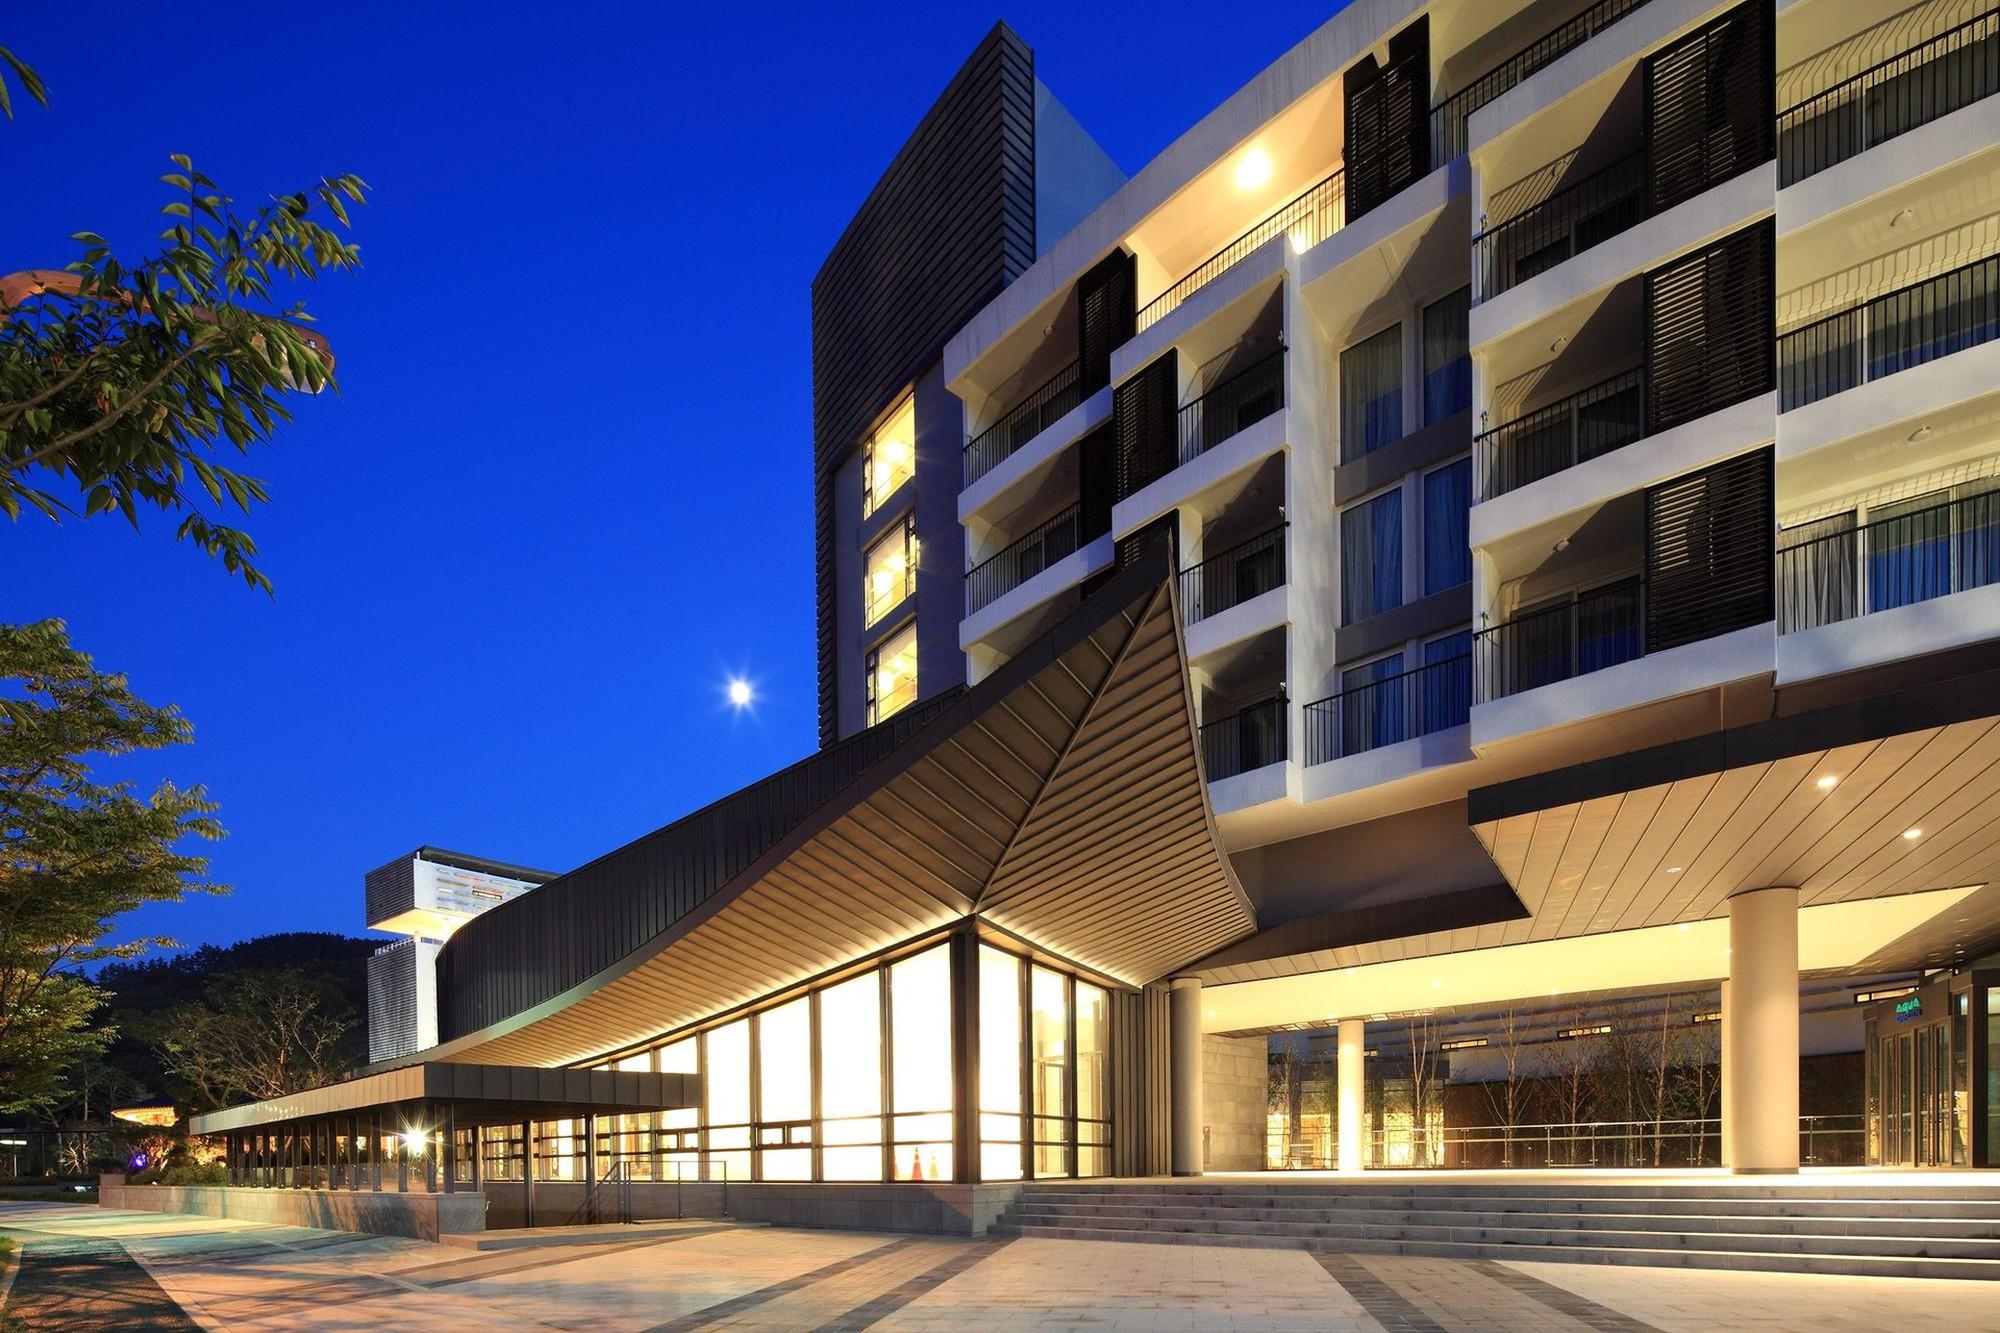 arch2o-lotte-buyeo-resort-baeksangwon-kim-seunghoy-seoul-national-university-kywc-architects-15-1539659912969972178834.jpg